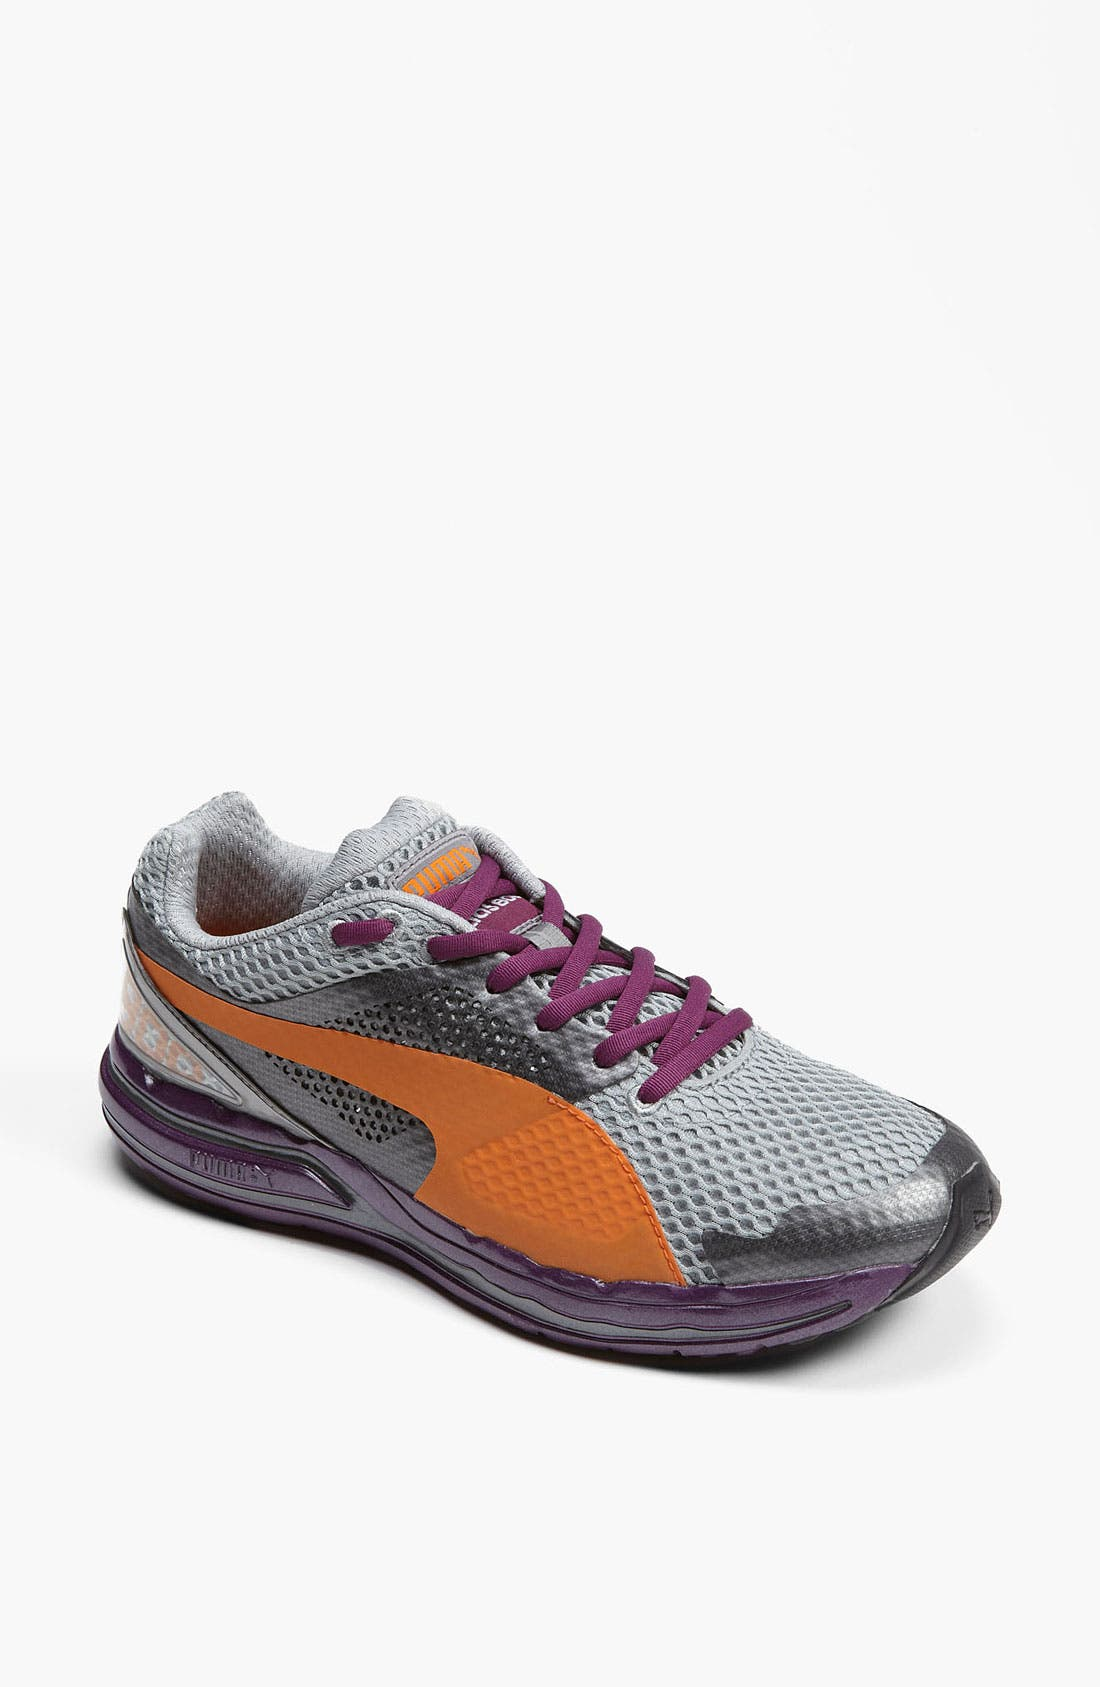 Alternate Image 1 Selected - PUMA 'Faas 800 S' Sneaker (Women)